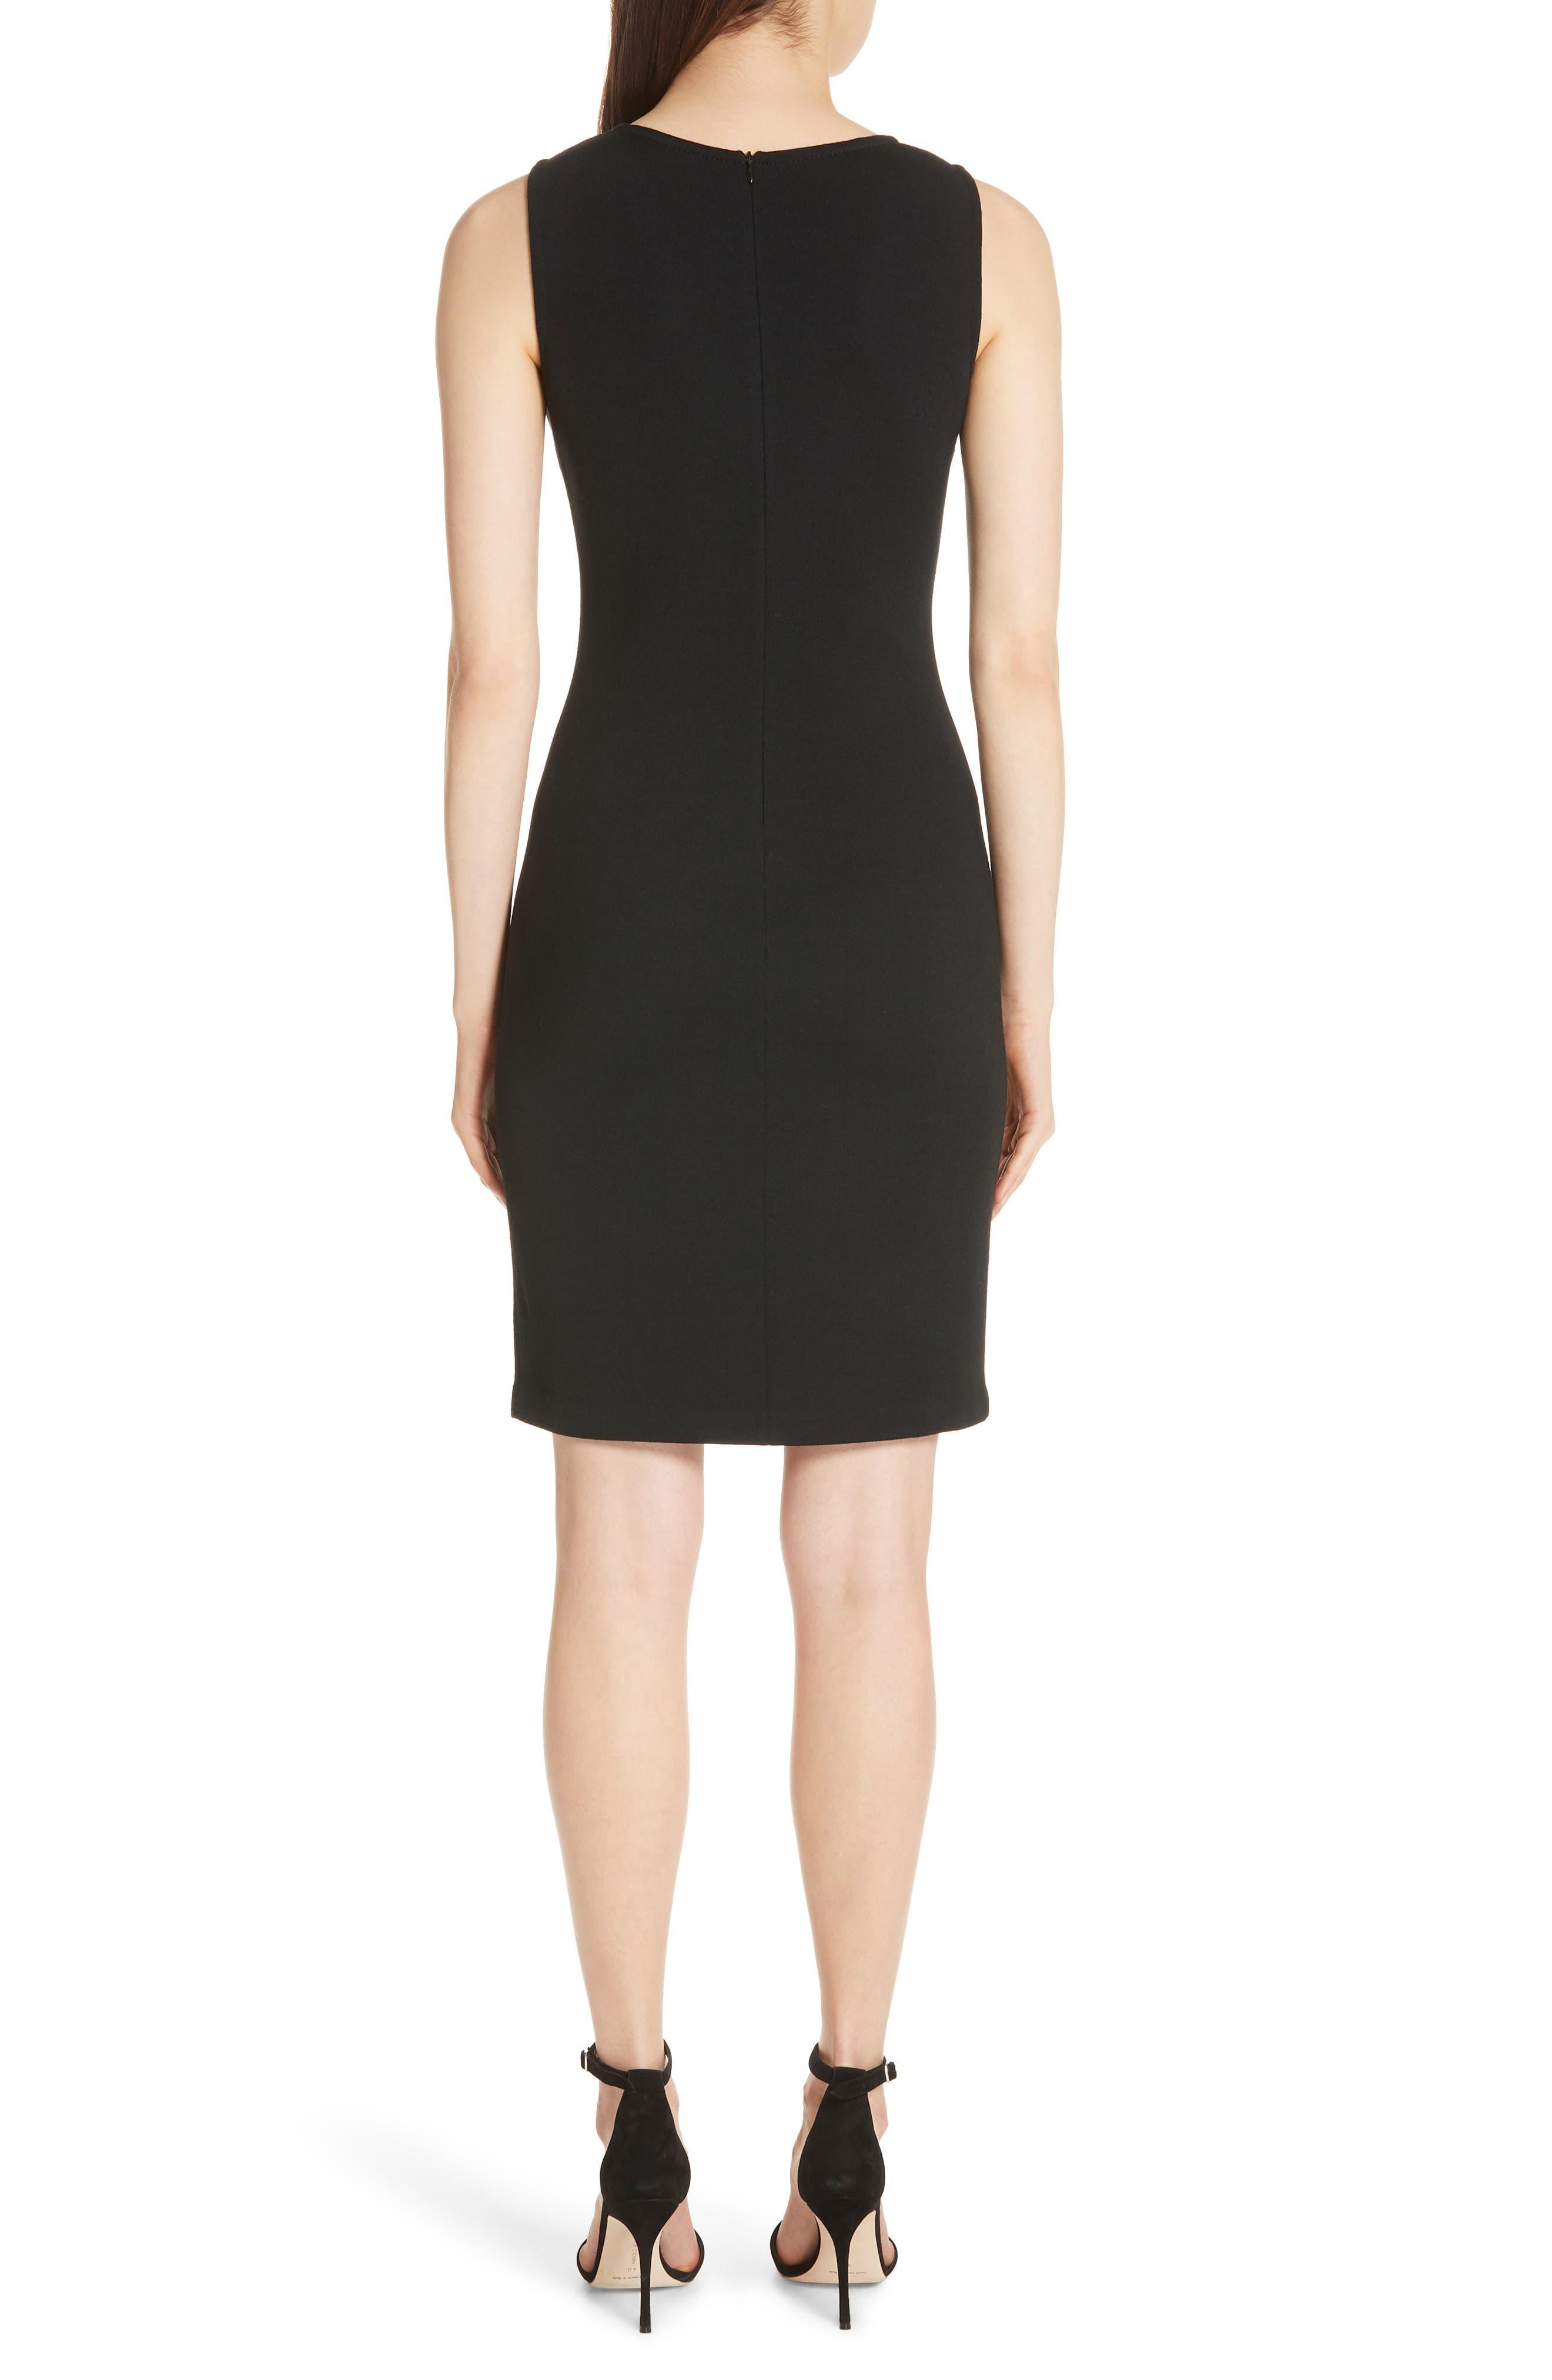 ST. JOHN COLLECTION,                             Sleeveless Milano Knit Dress,                             Alternate thumbnail 2, color,                             CAVIAR